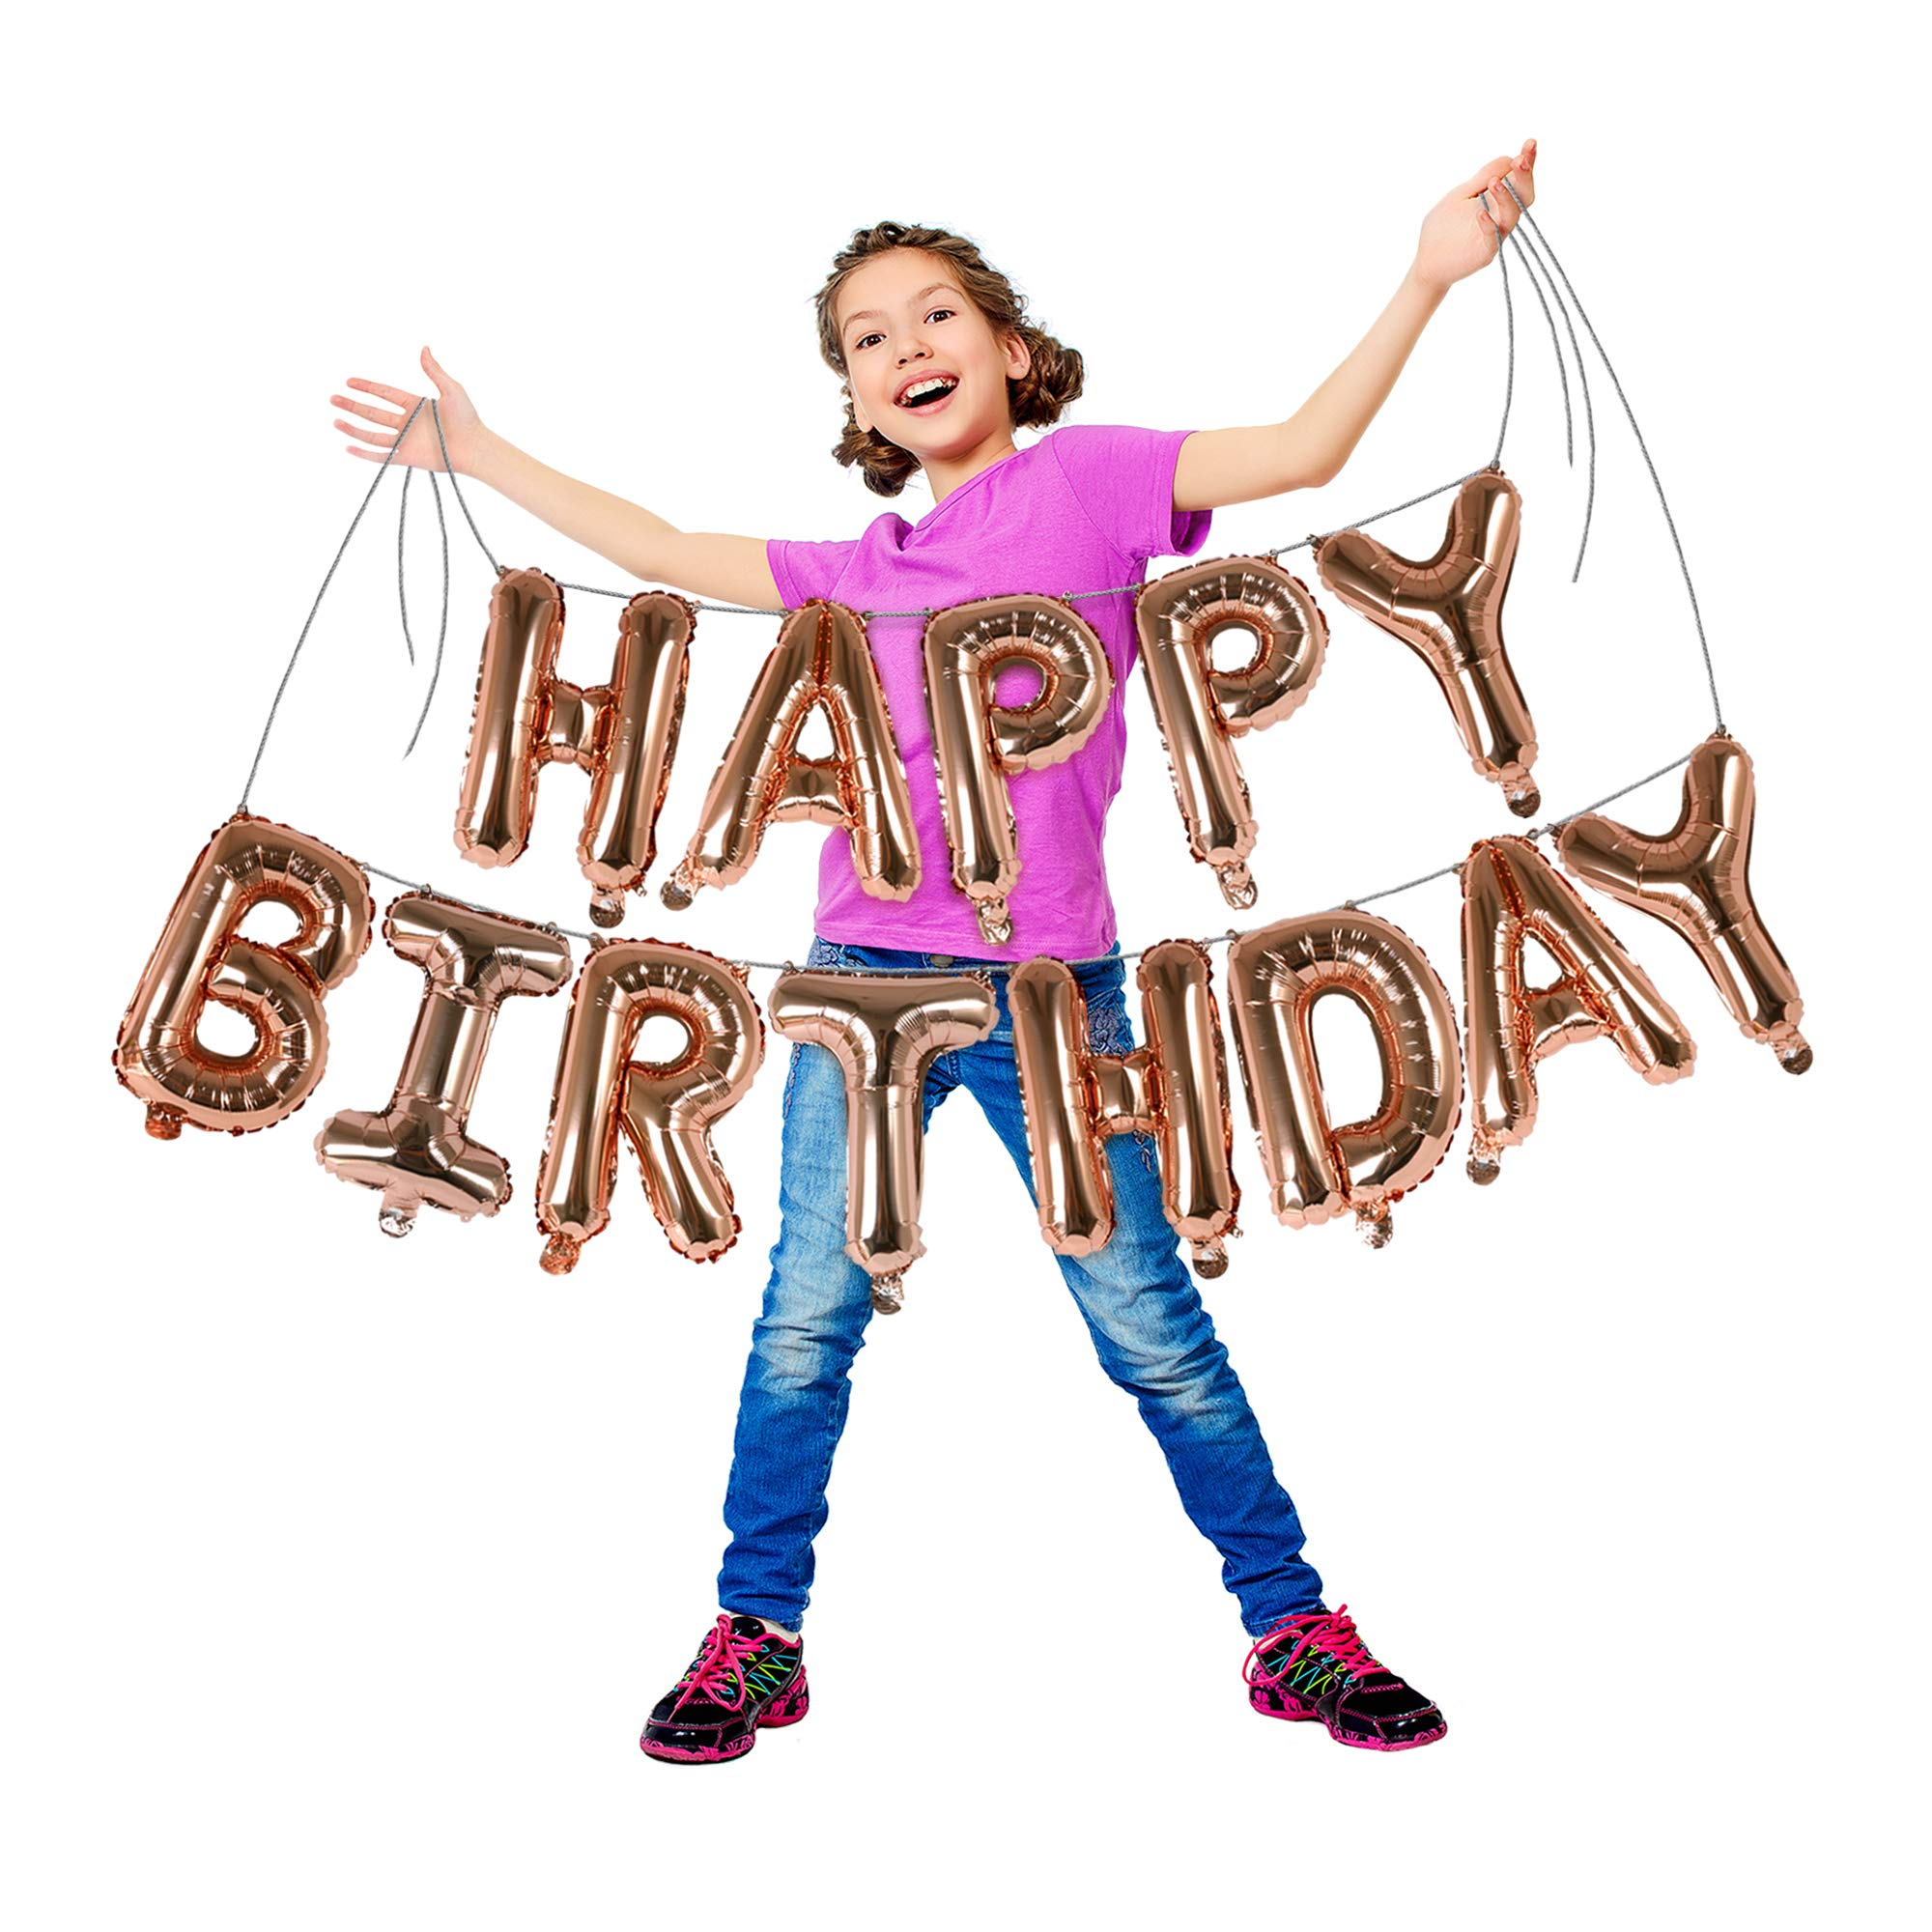 Magenta Mylar Letter Balloon Banner Birthday Bachelorette Color Rose Gold Silver Blue Foil Letters 16 Hot Pink Letter Number Balloons